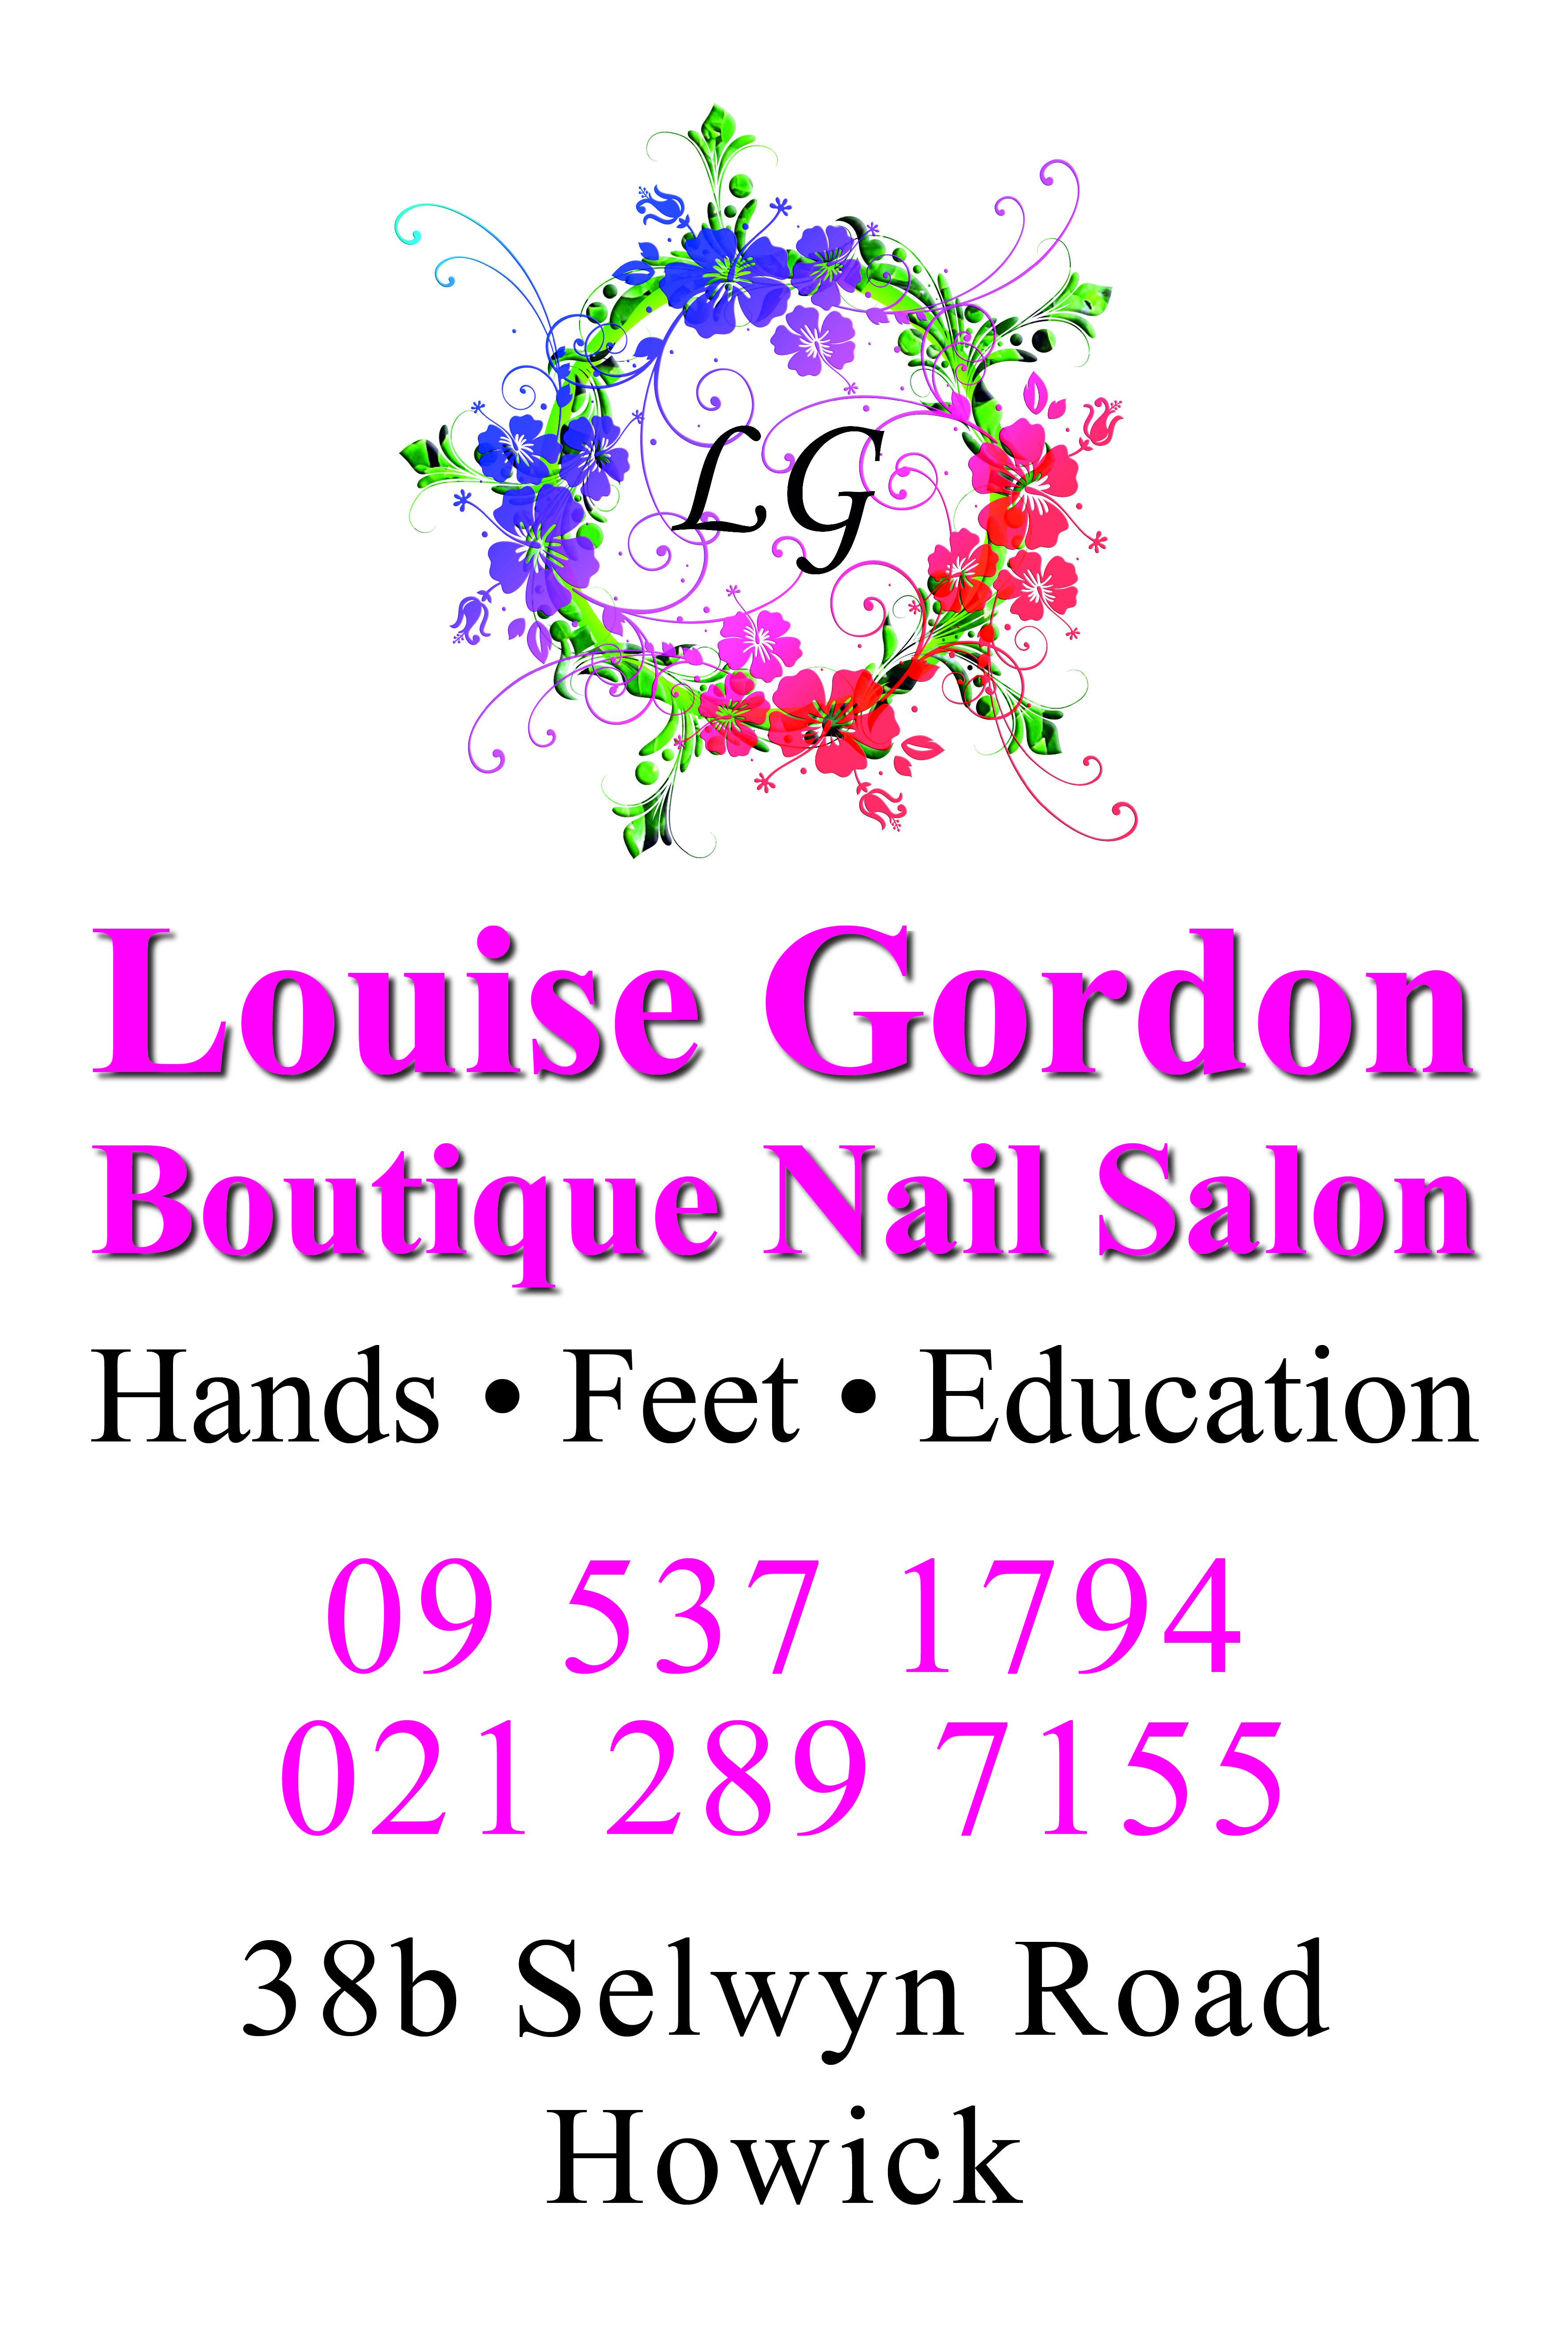 Louise Gordon Boutique Nail Salon